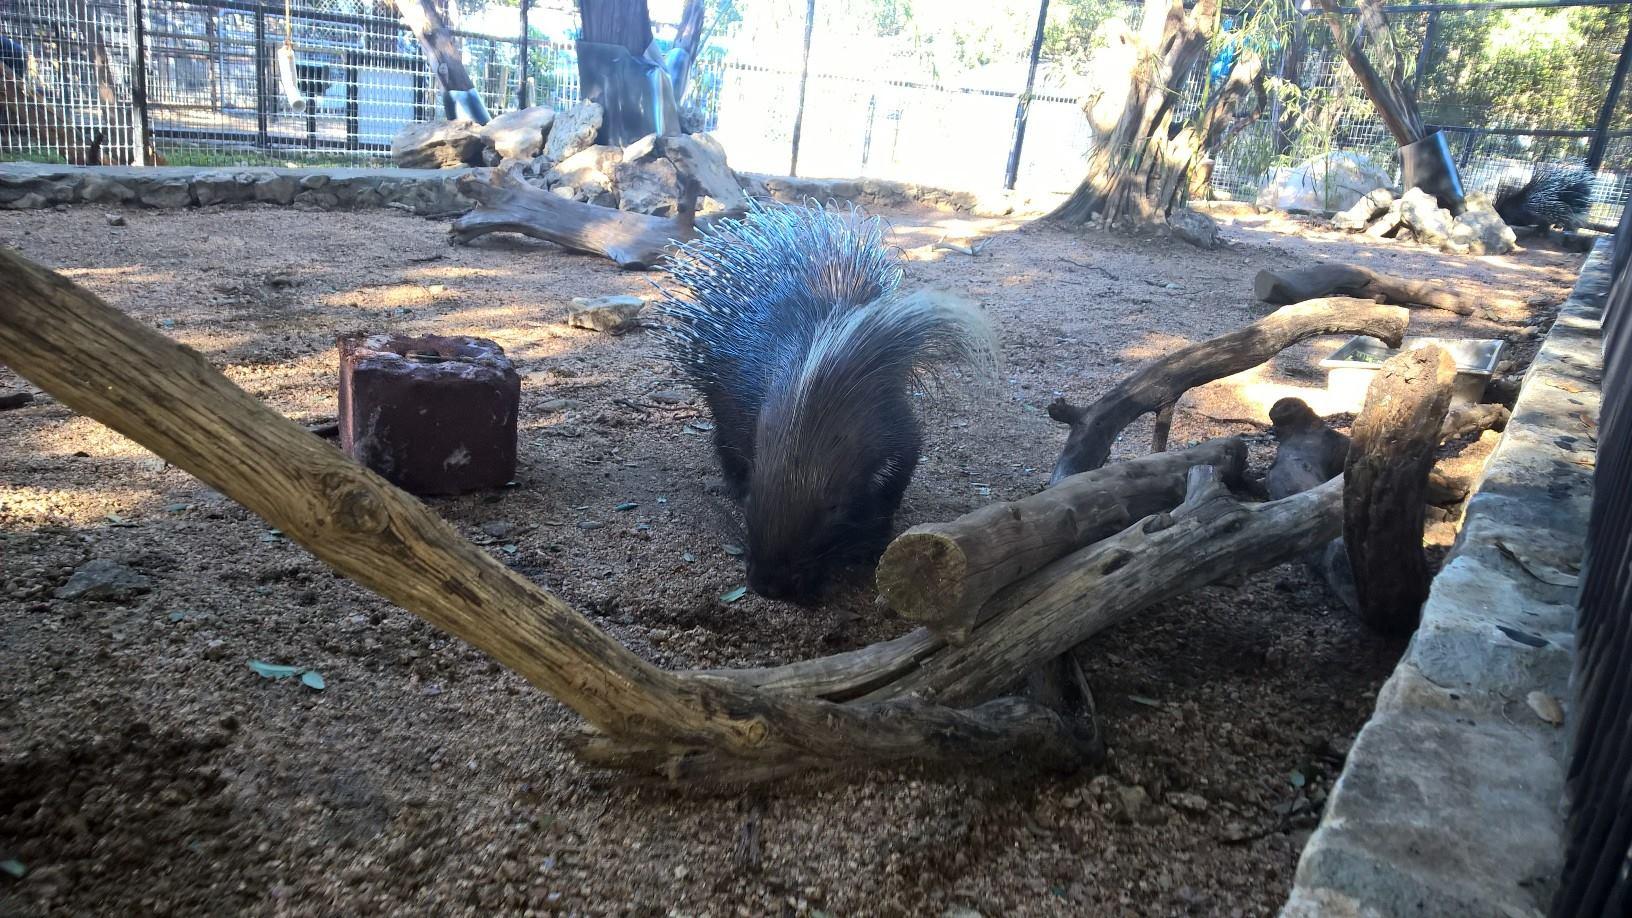 Porcupine3